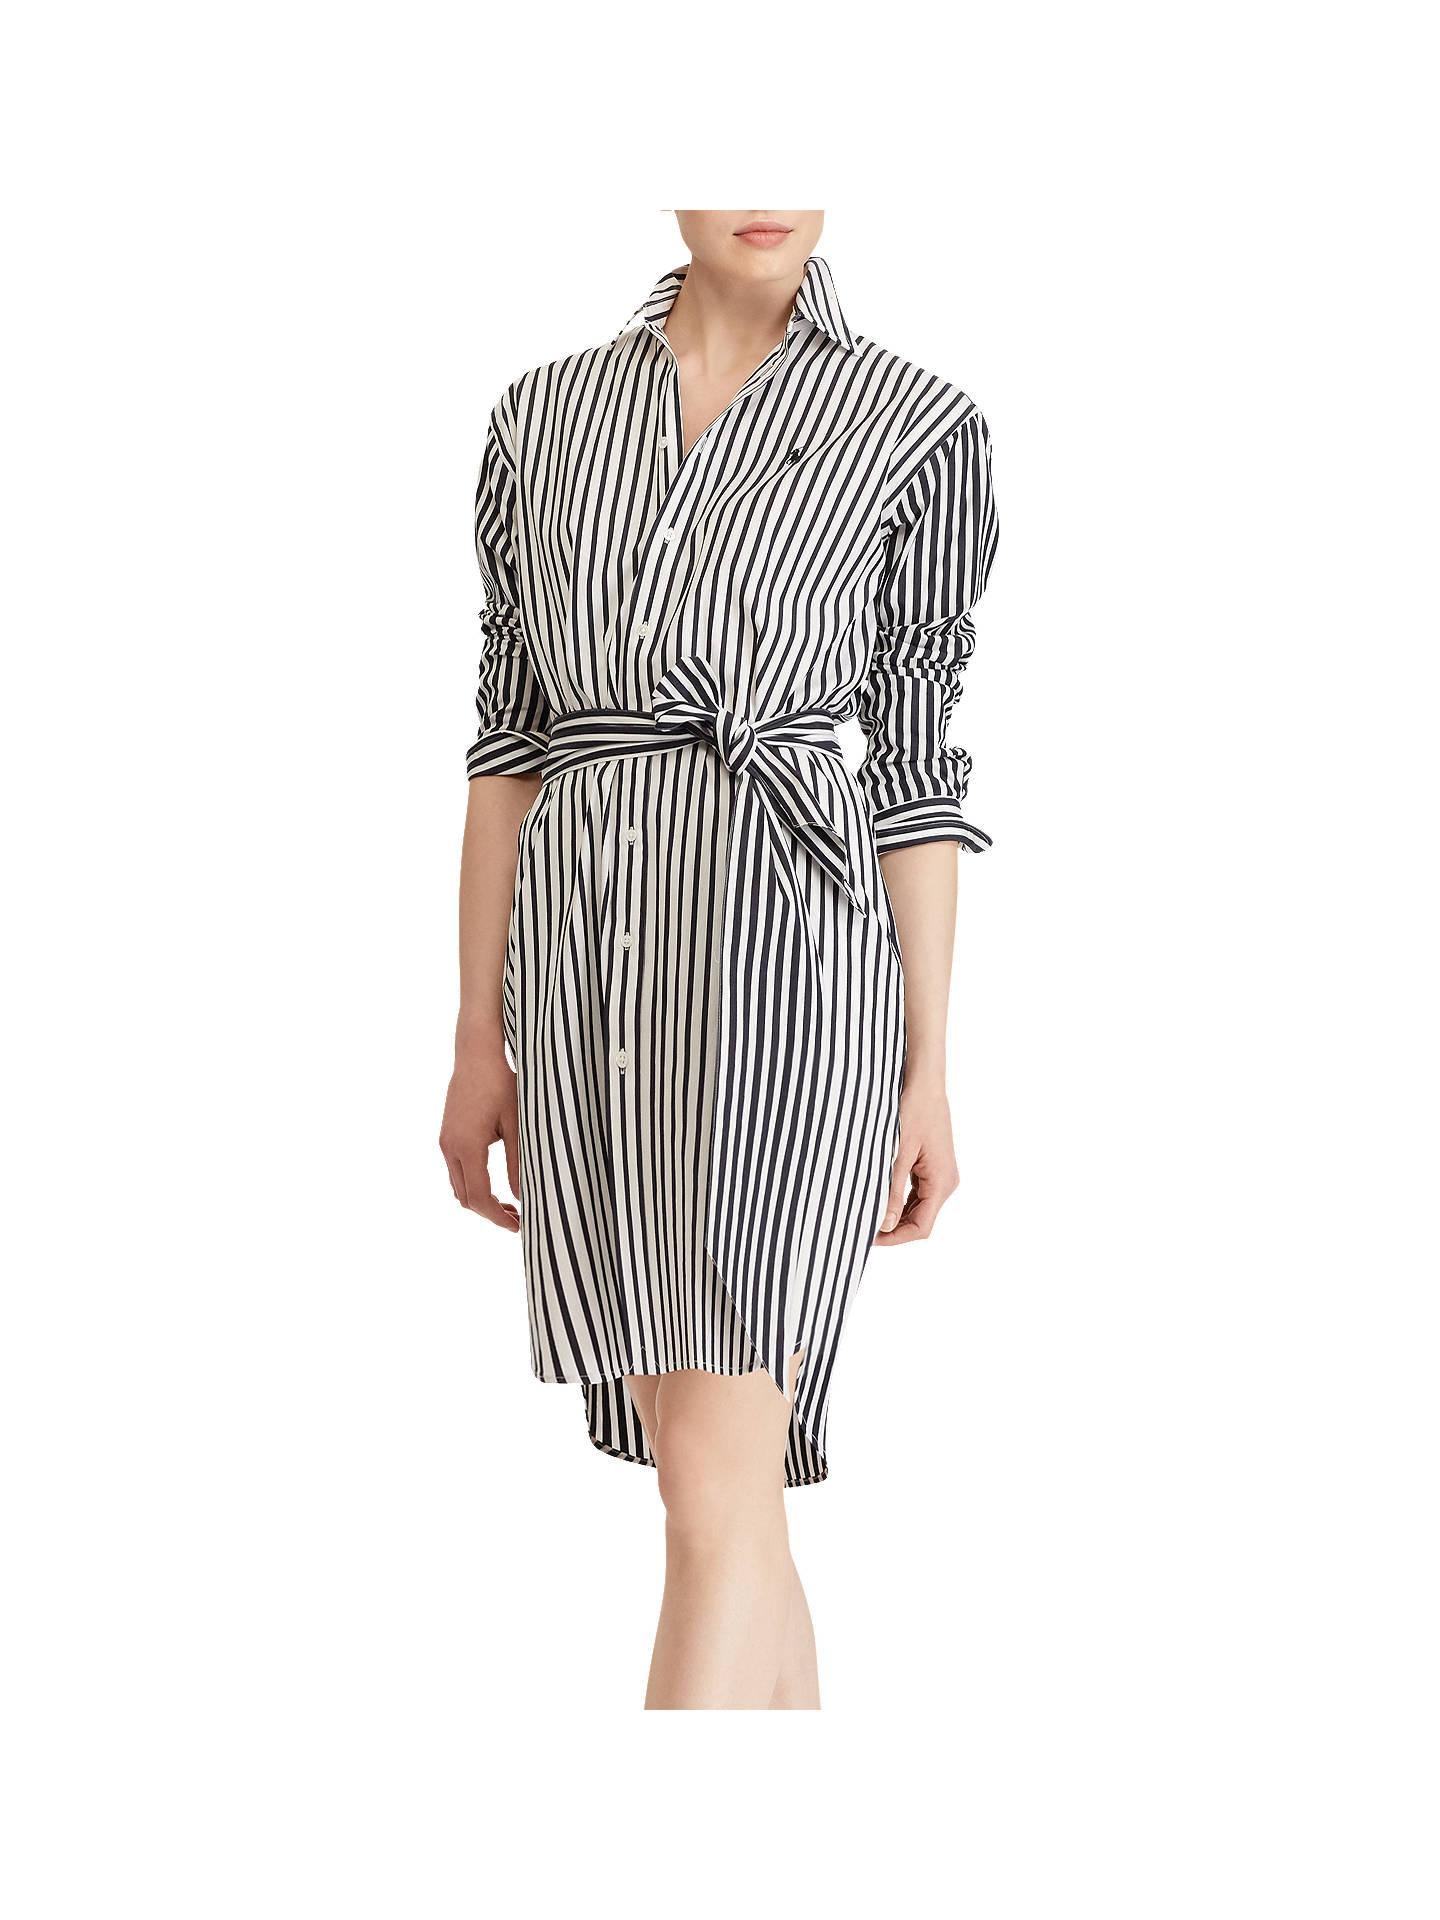 Polo Ralph Lauren Women's Striped Shirt BlackWhite 8